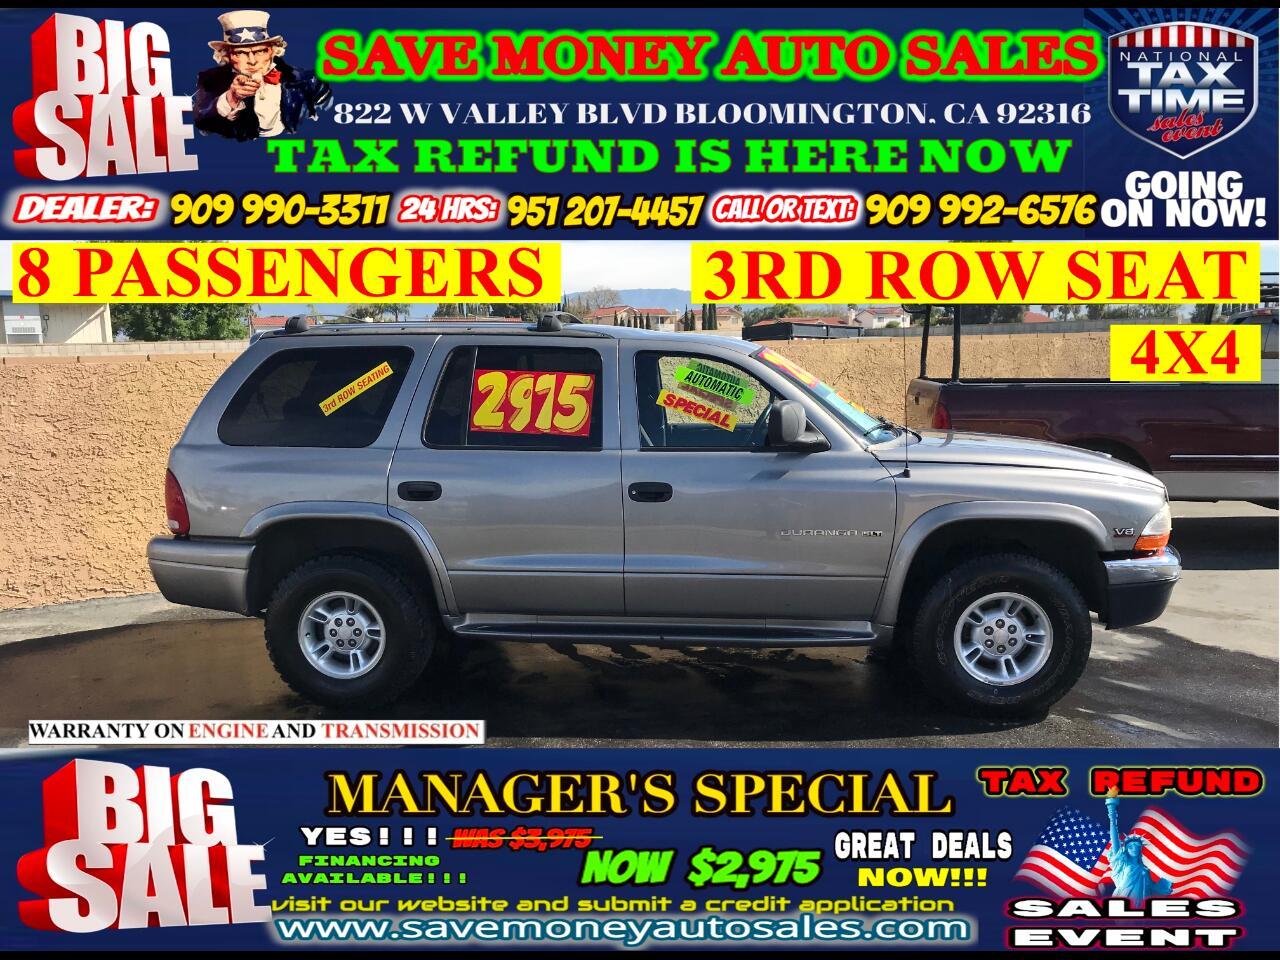 1999 Dodge Durango 4X4>8 PASSENGERS> EXTRA CLEAN>AUTOMATIC